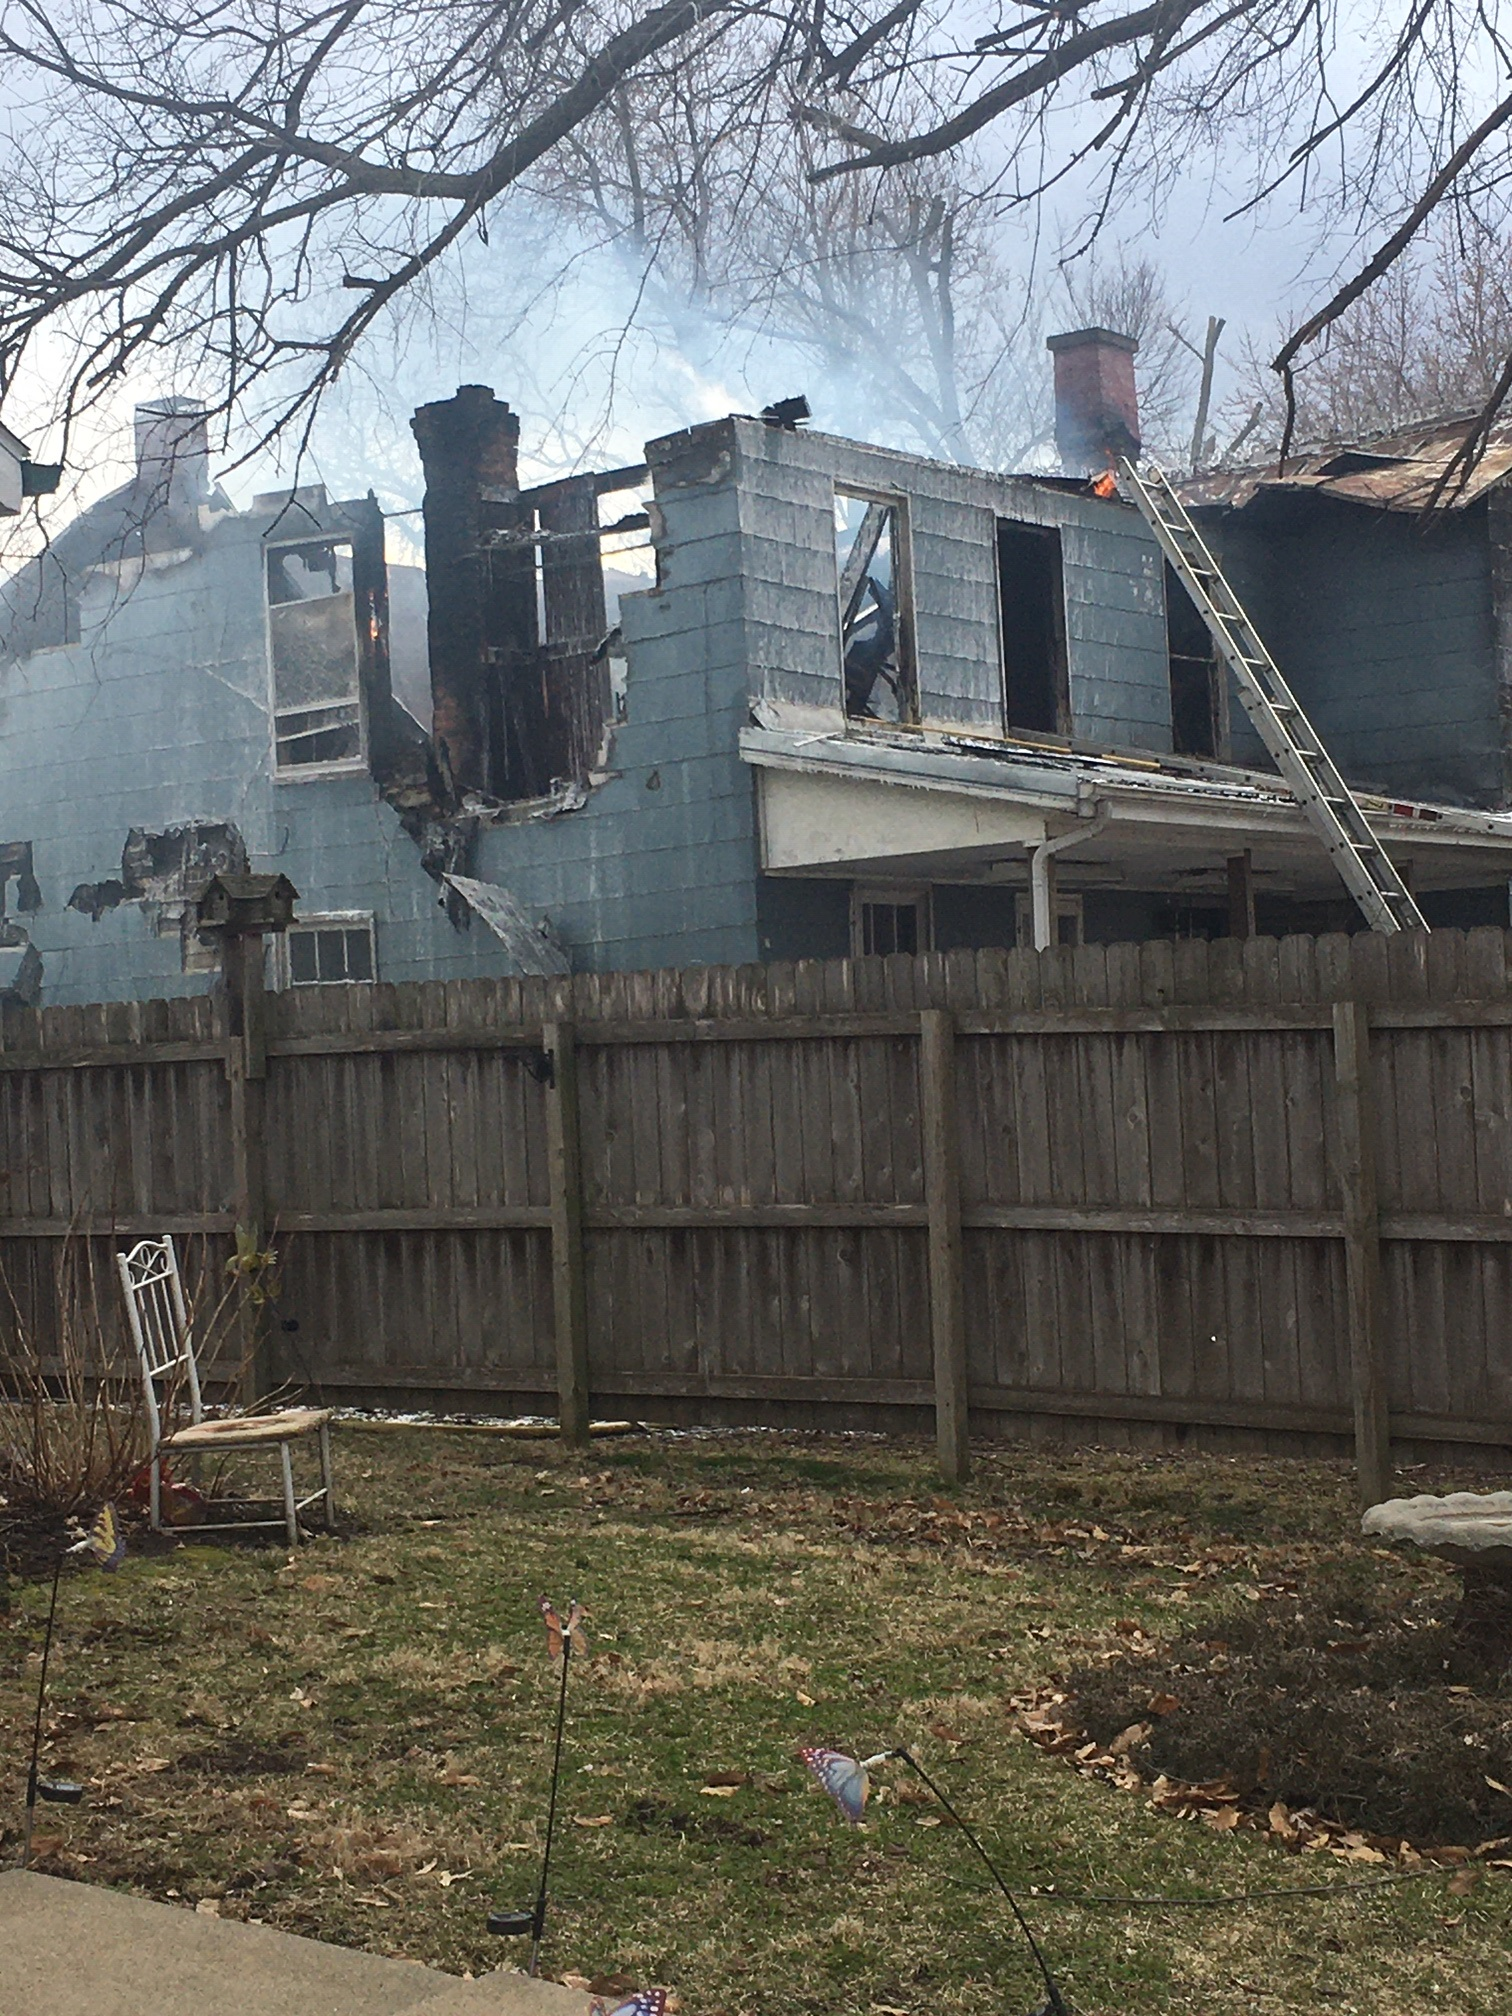 A fire destroys a home in California, Missouri.